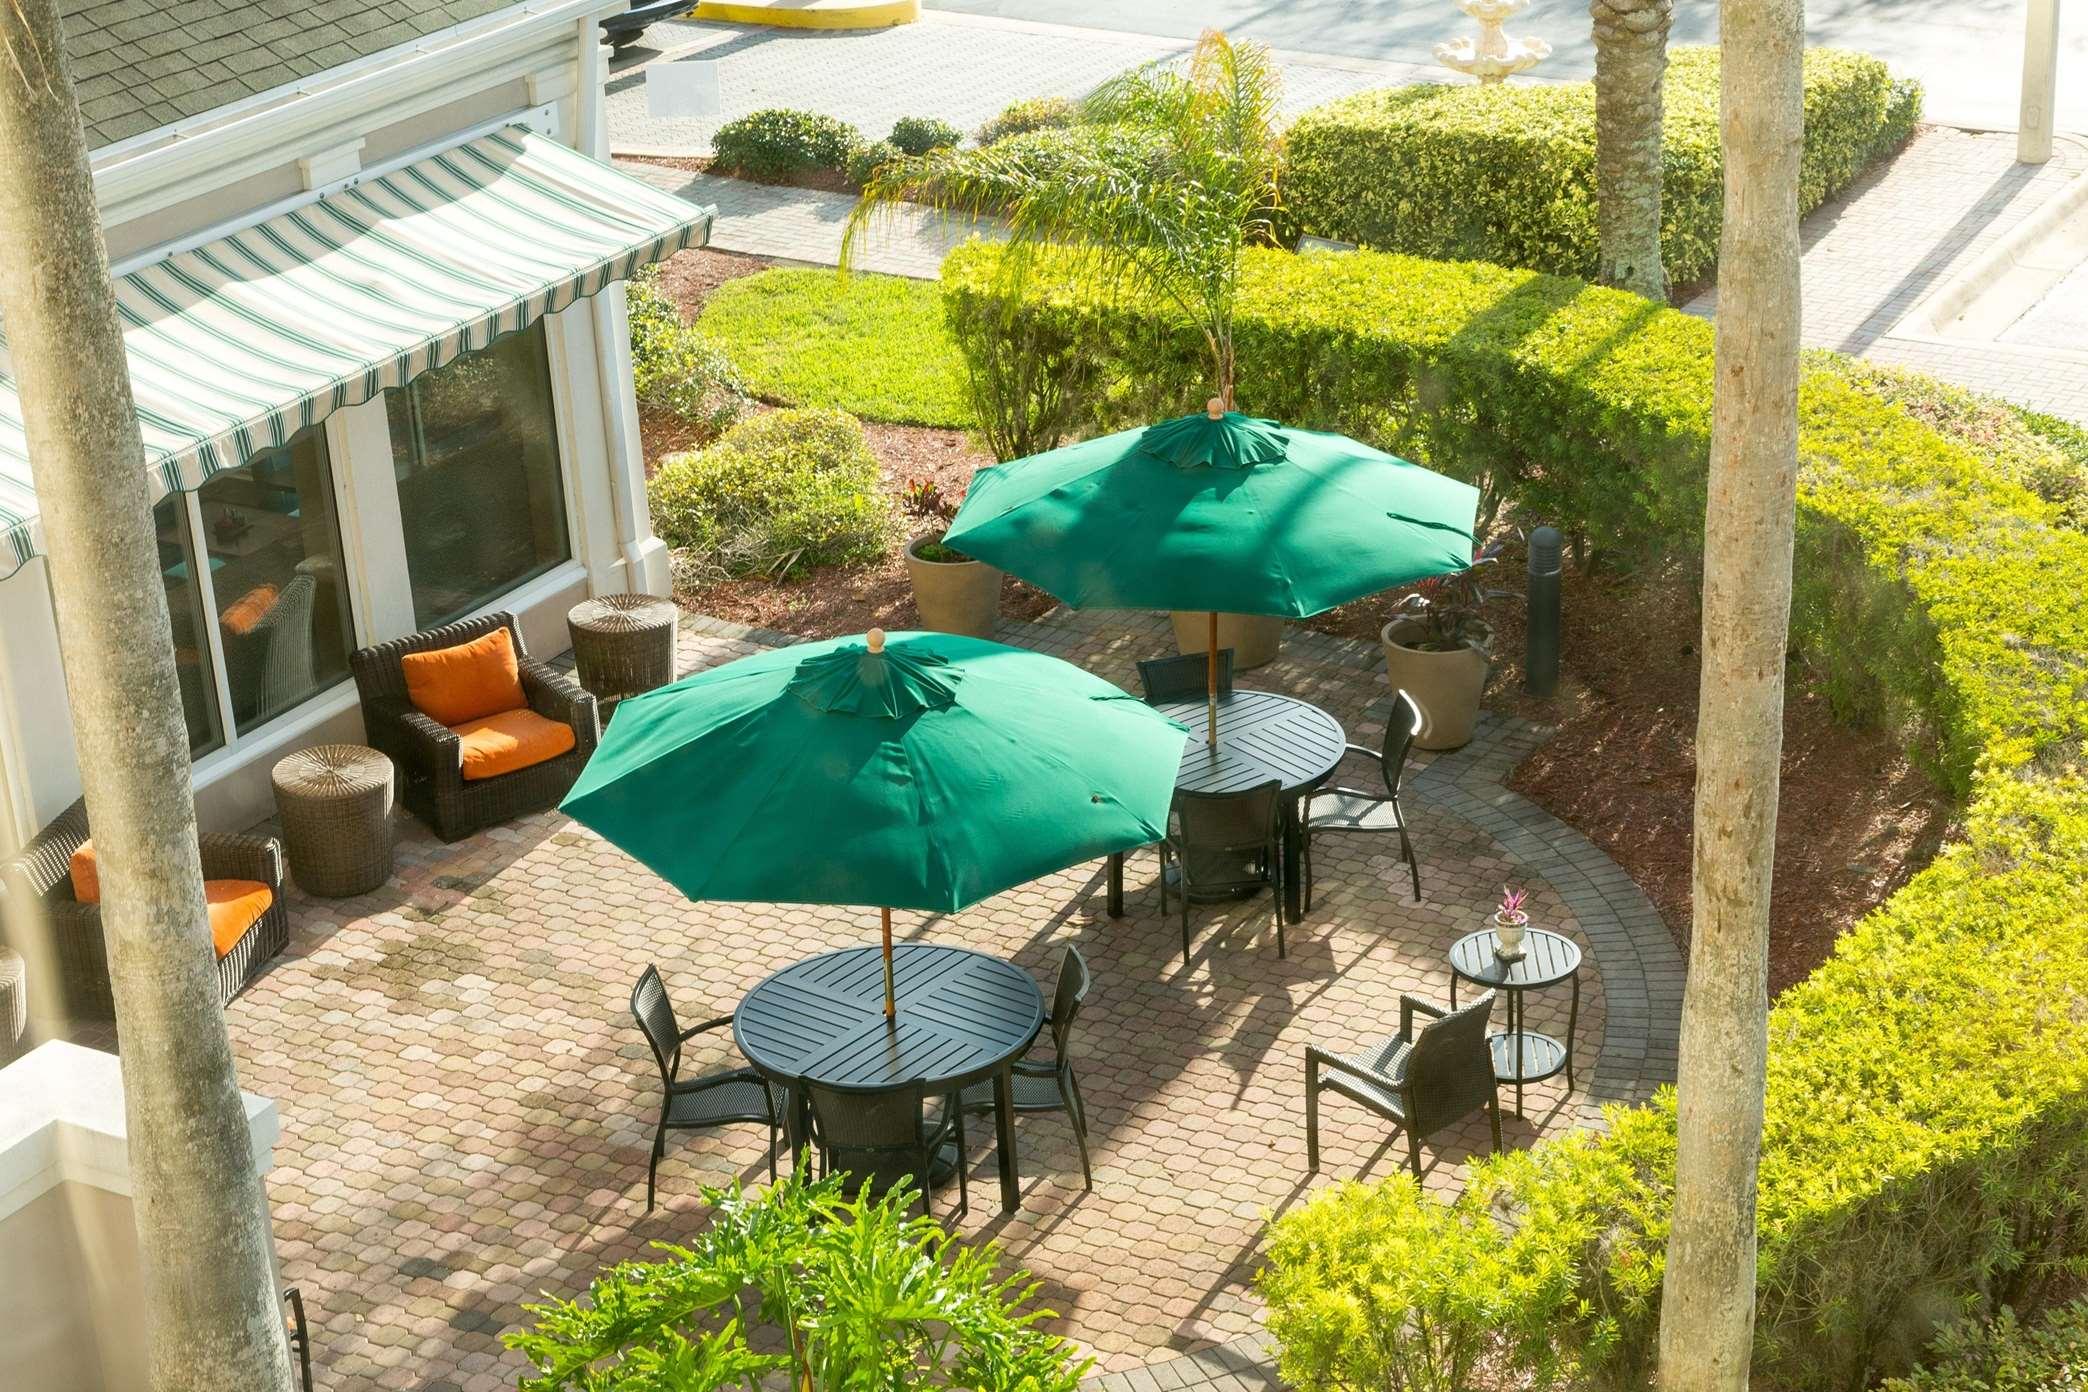 Hilton Garden Inn Daytona Beach Airport 189 Midway Avenue Daytona ...